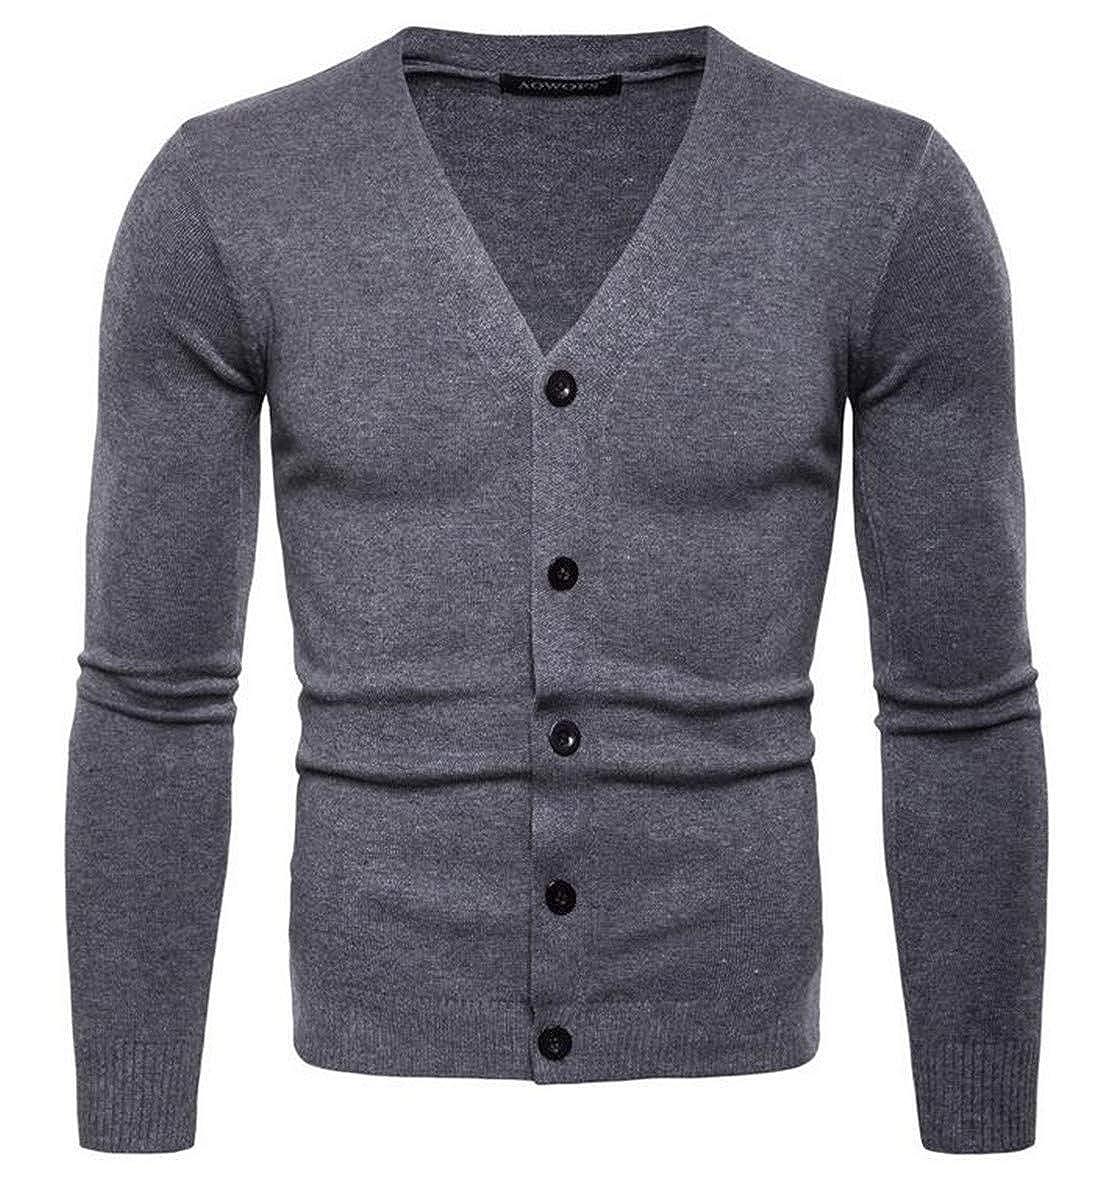 BU2H Men Shawl Collar Cardigan Sweater Button Down Knitwear Overcoat